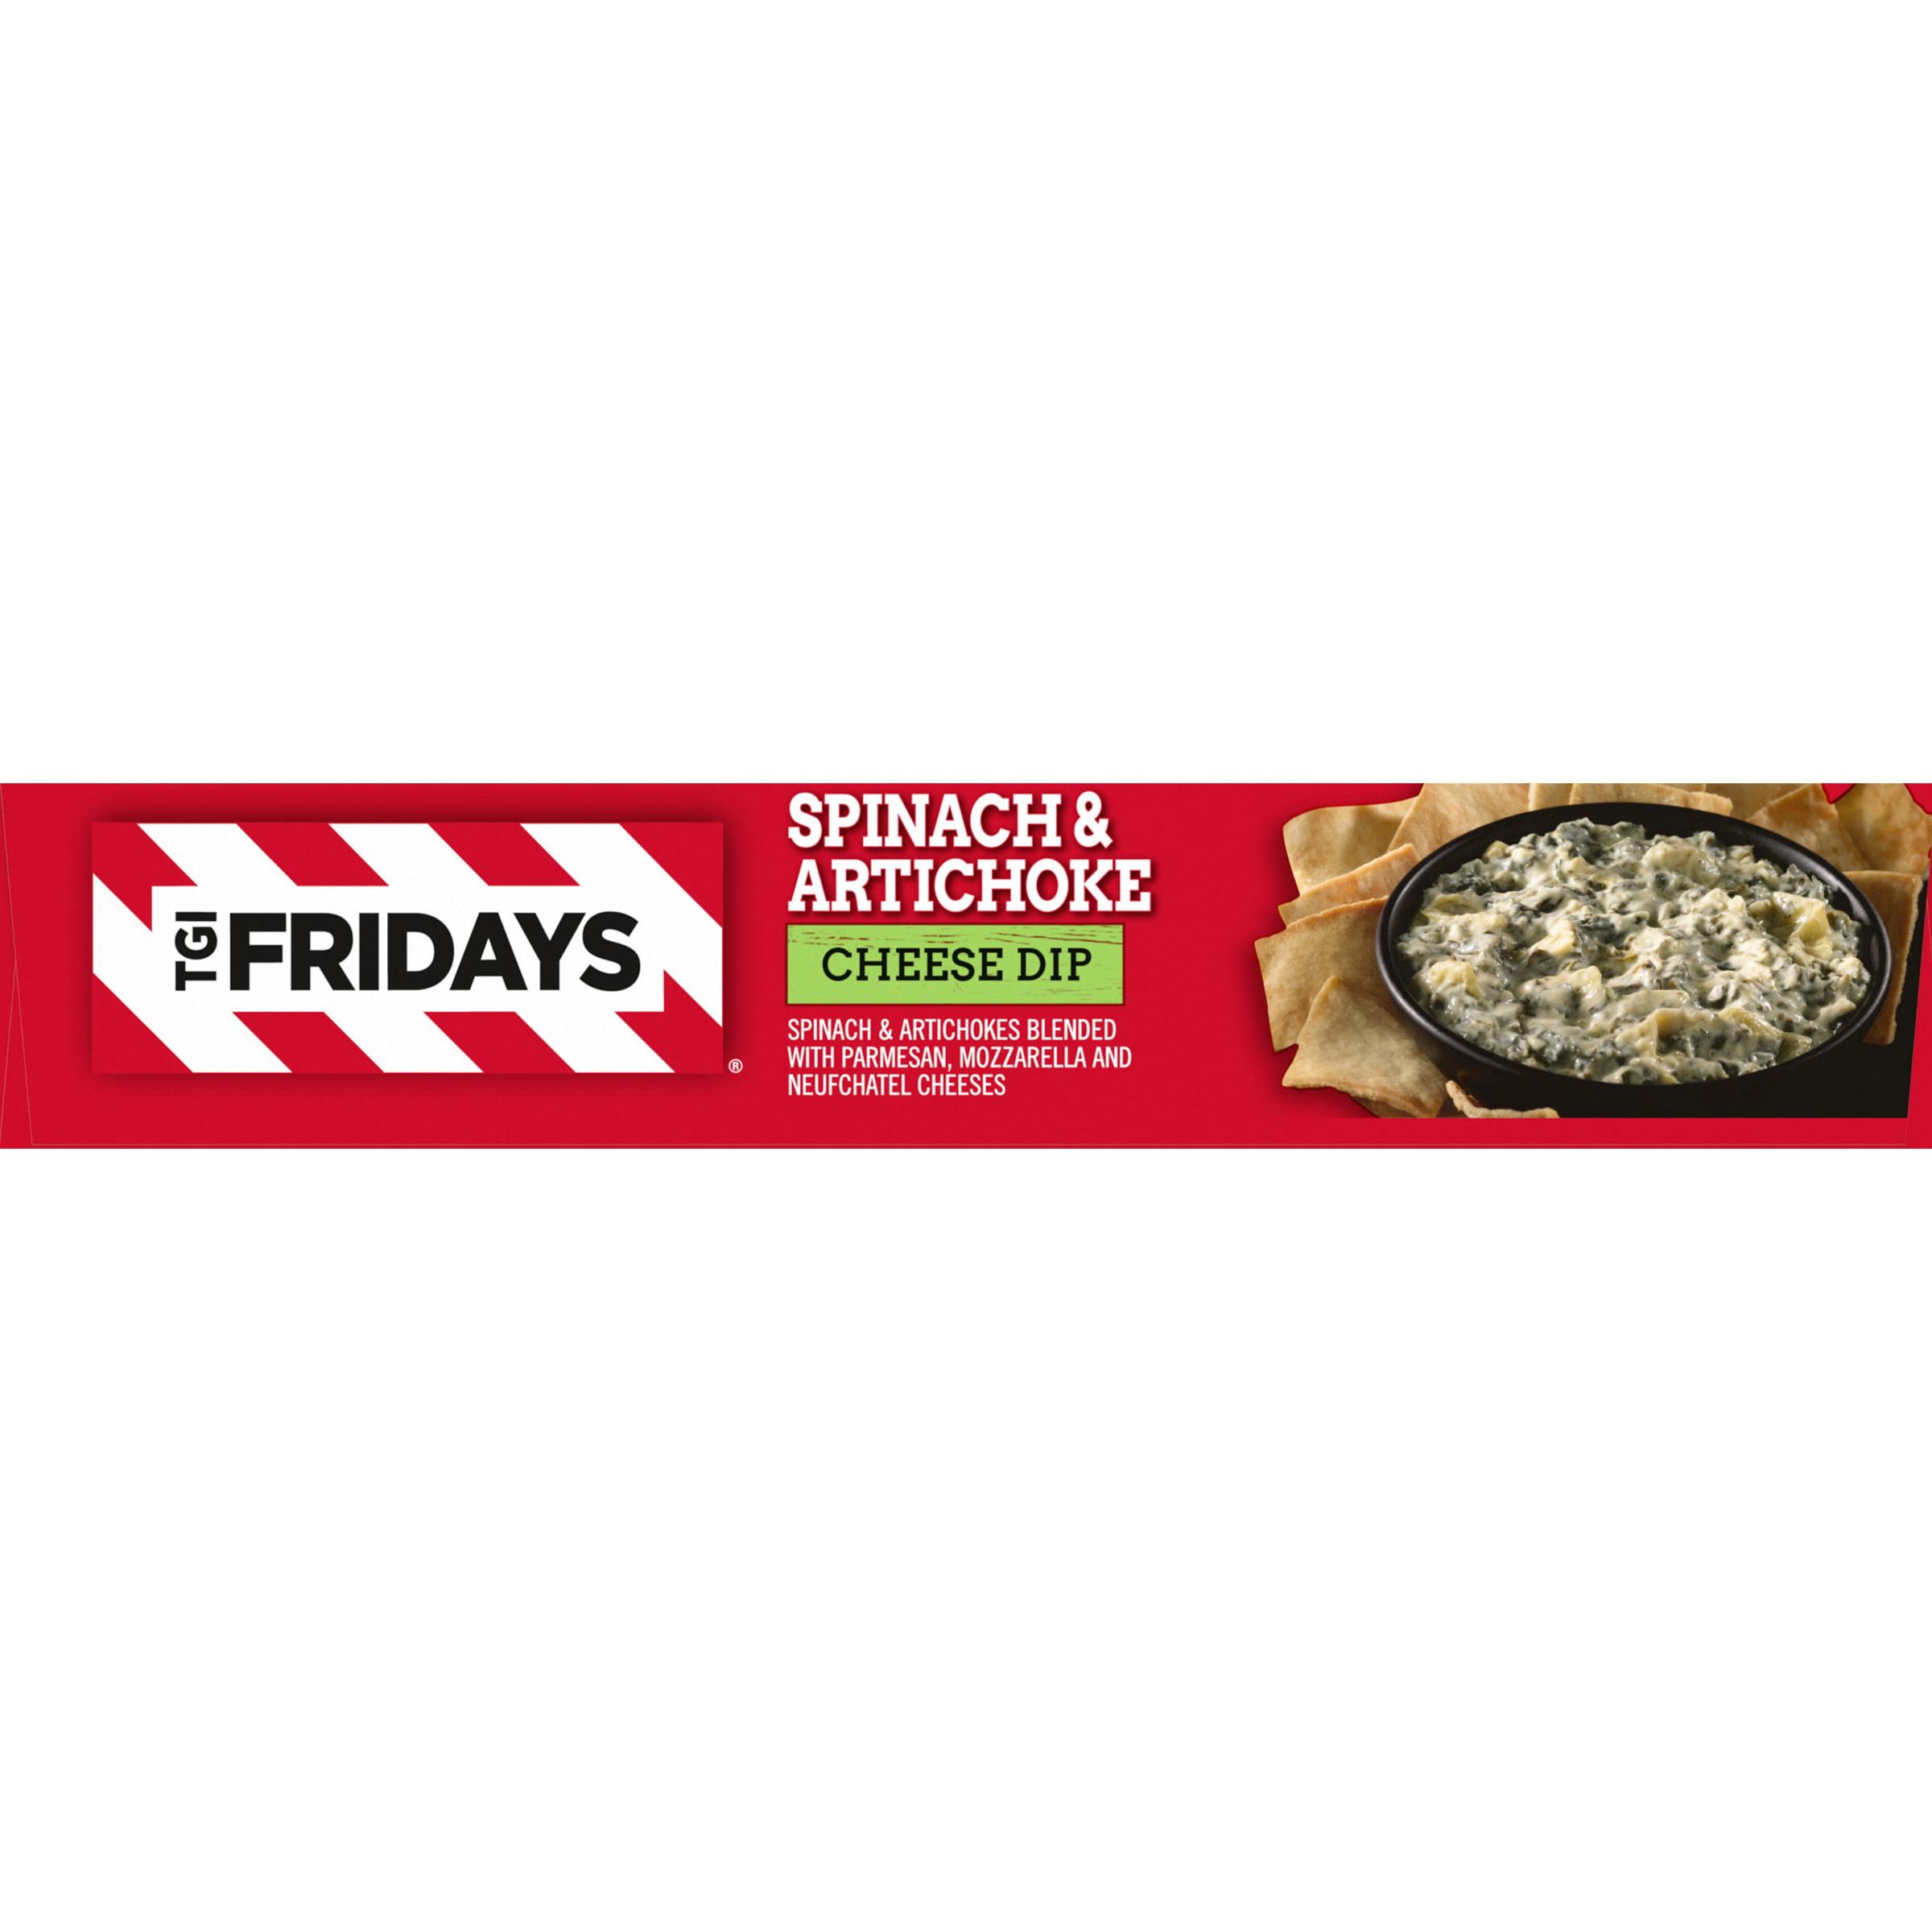 Tgi Fridays Spinach Artichoke Cheese Dip 8 Oz Box Walmart Com Walmart Com